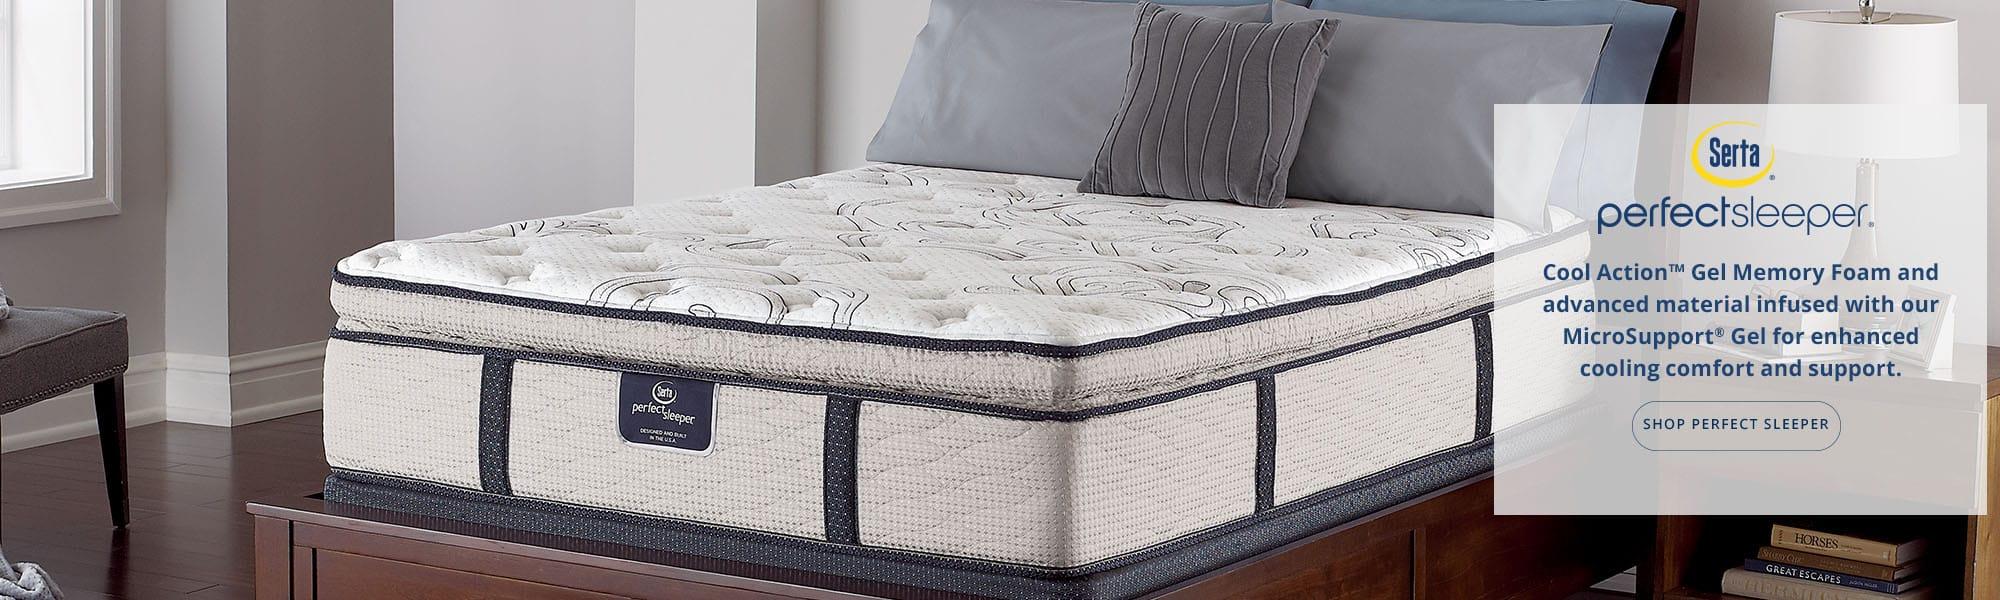 Serta Perfect Sleeper banner